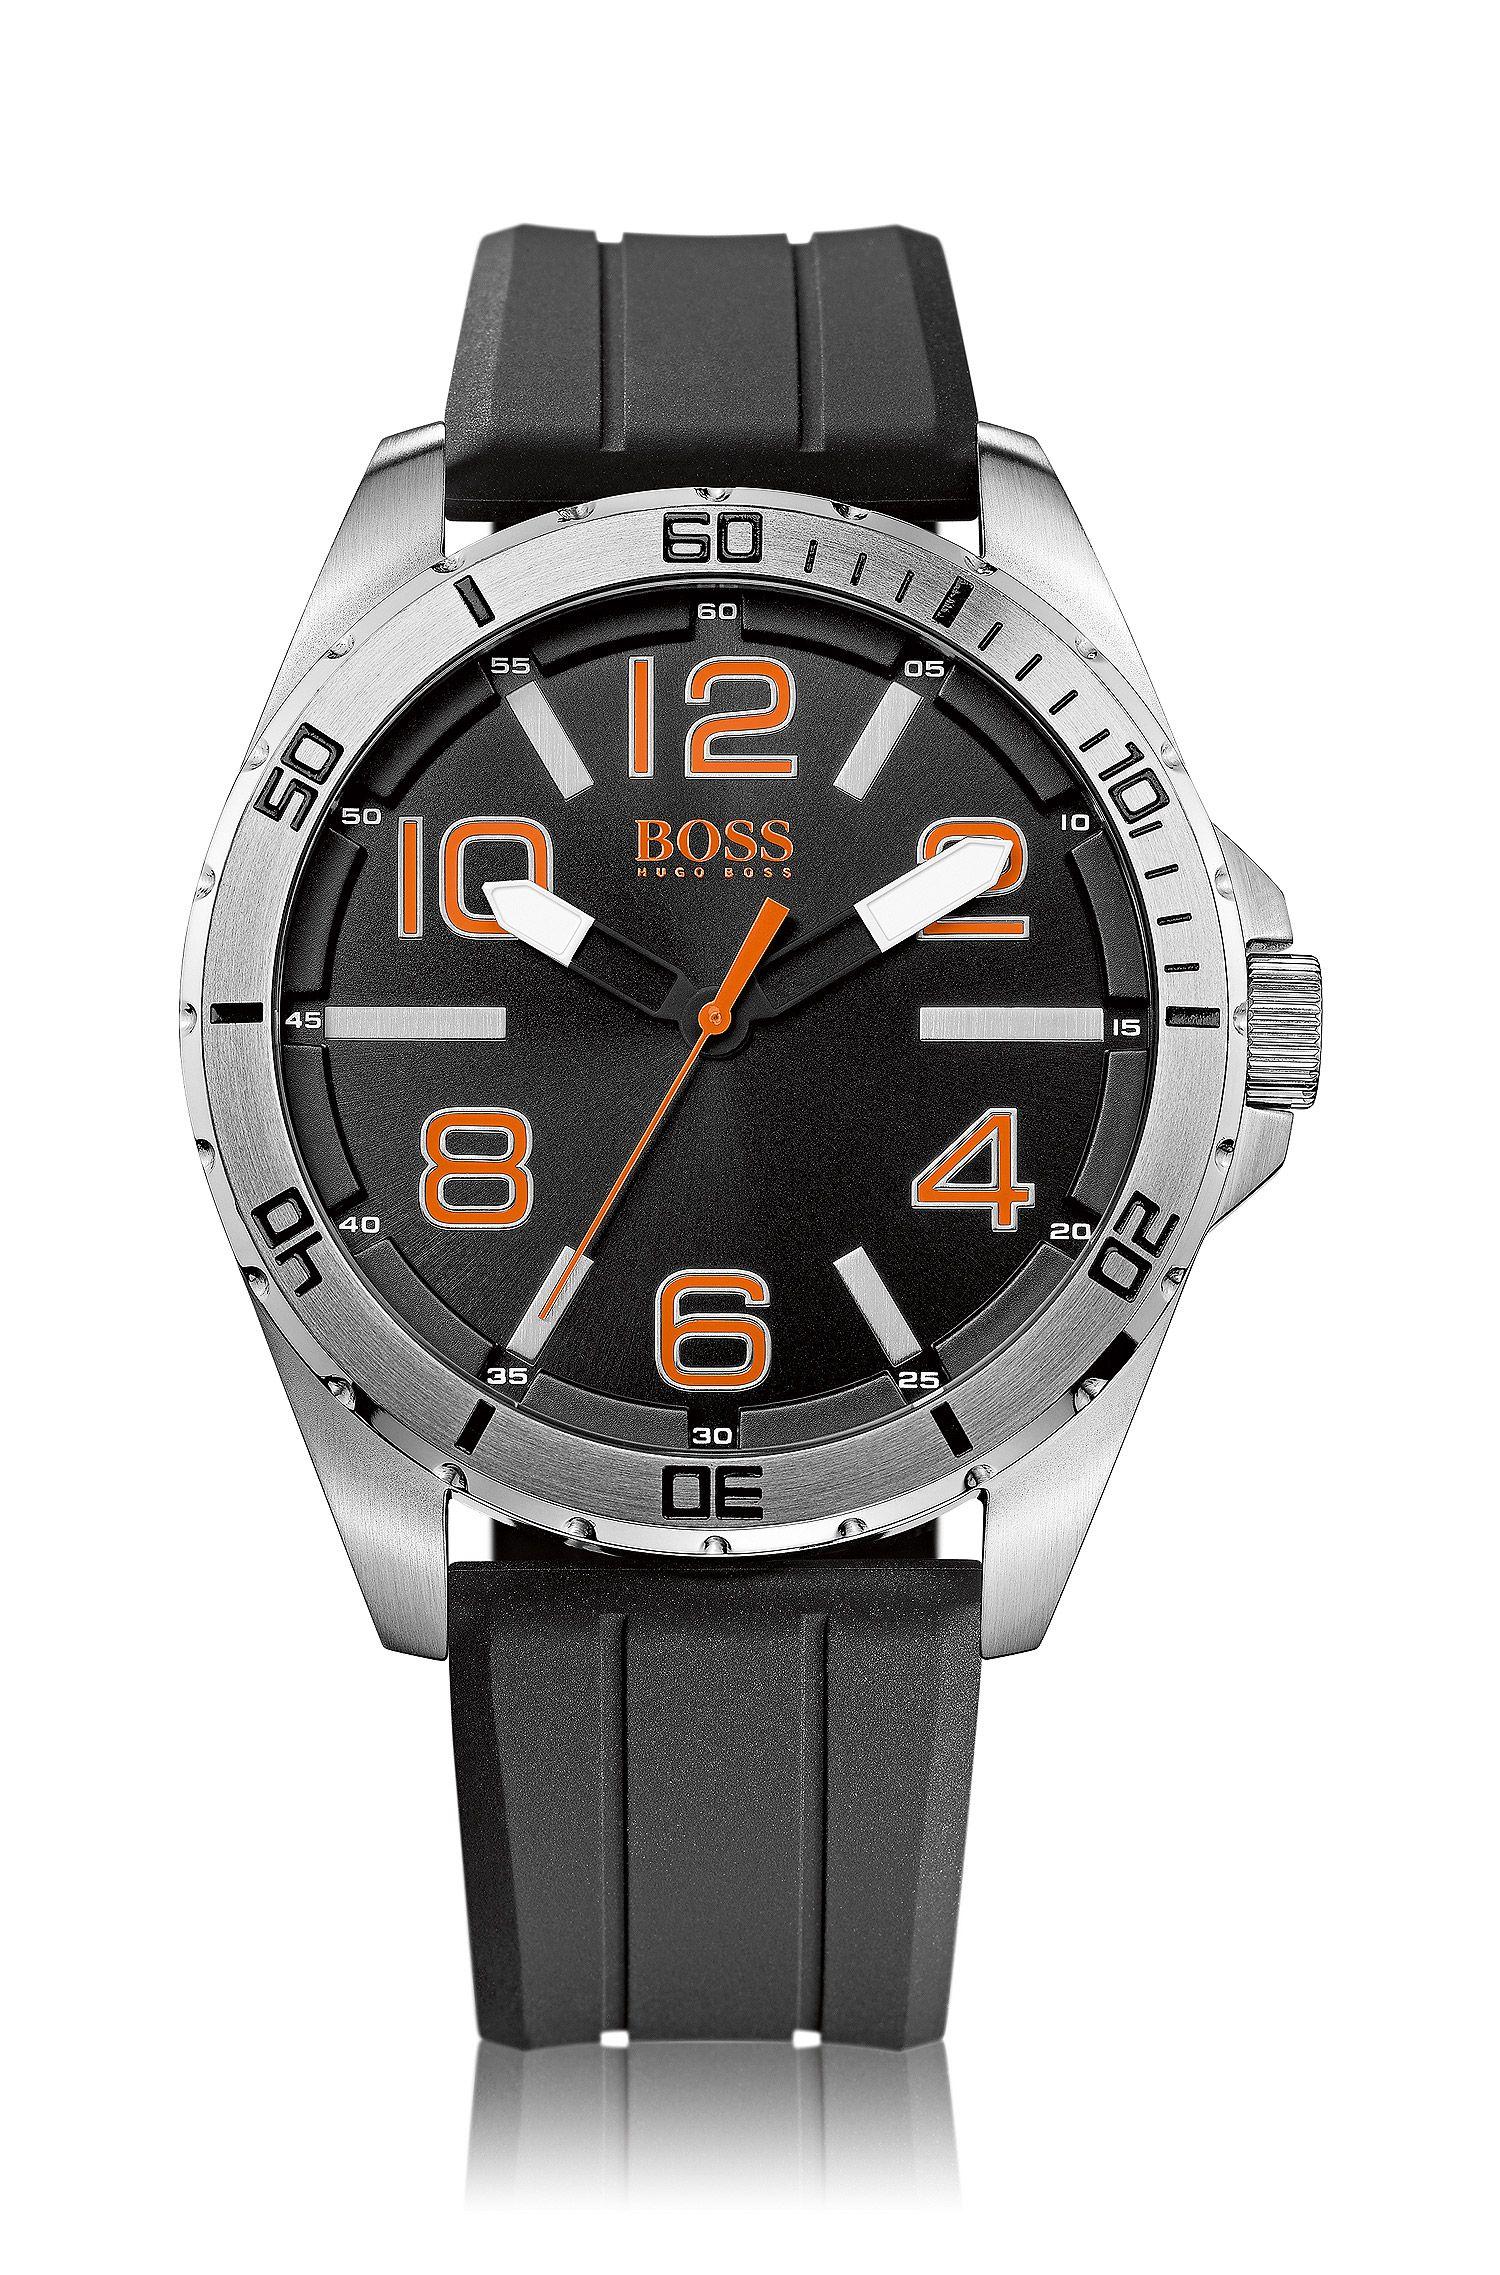 Montre-bracelet «HO7004» avec boîtier en acier inoxydable